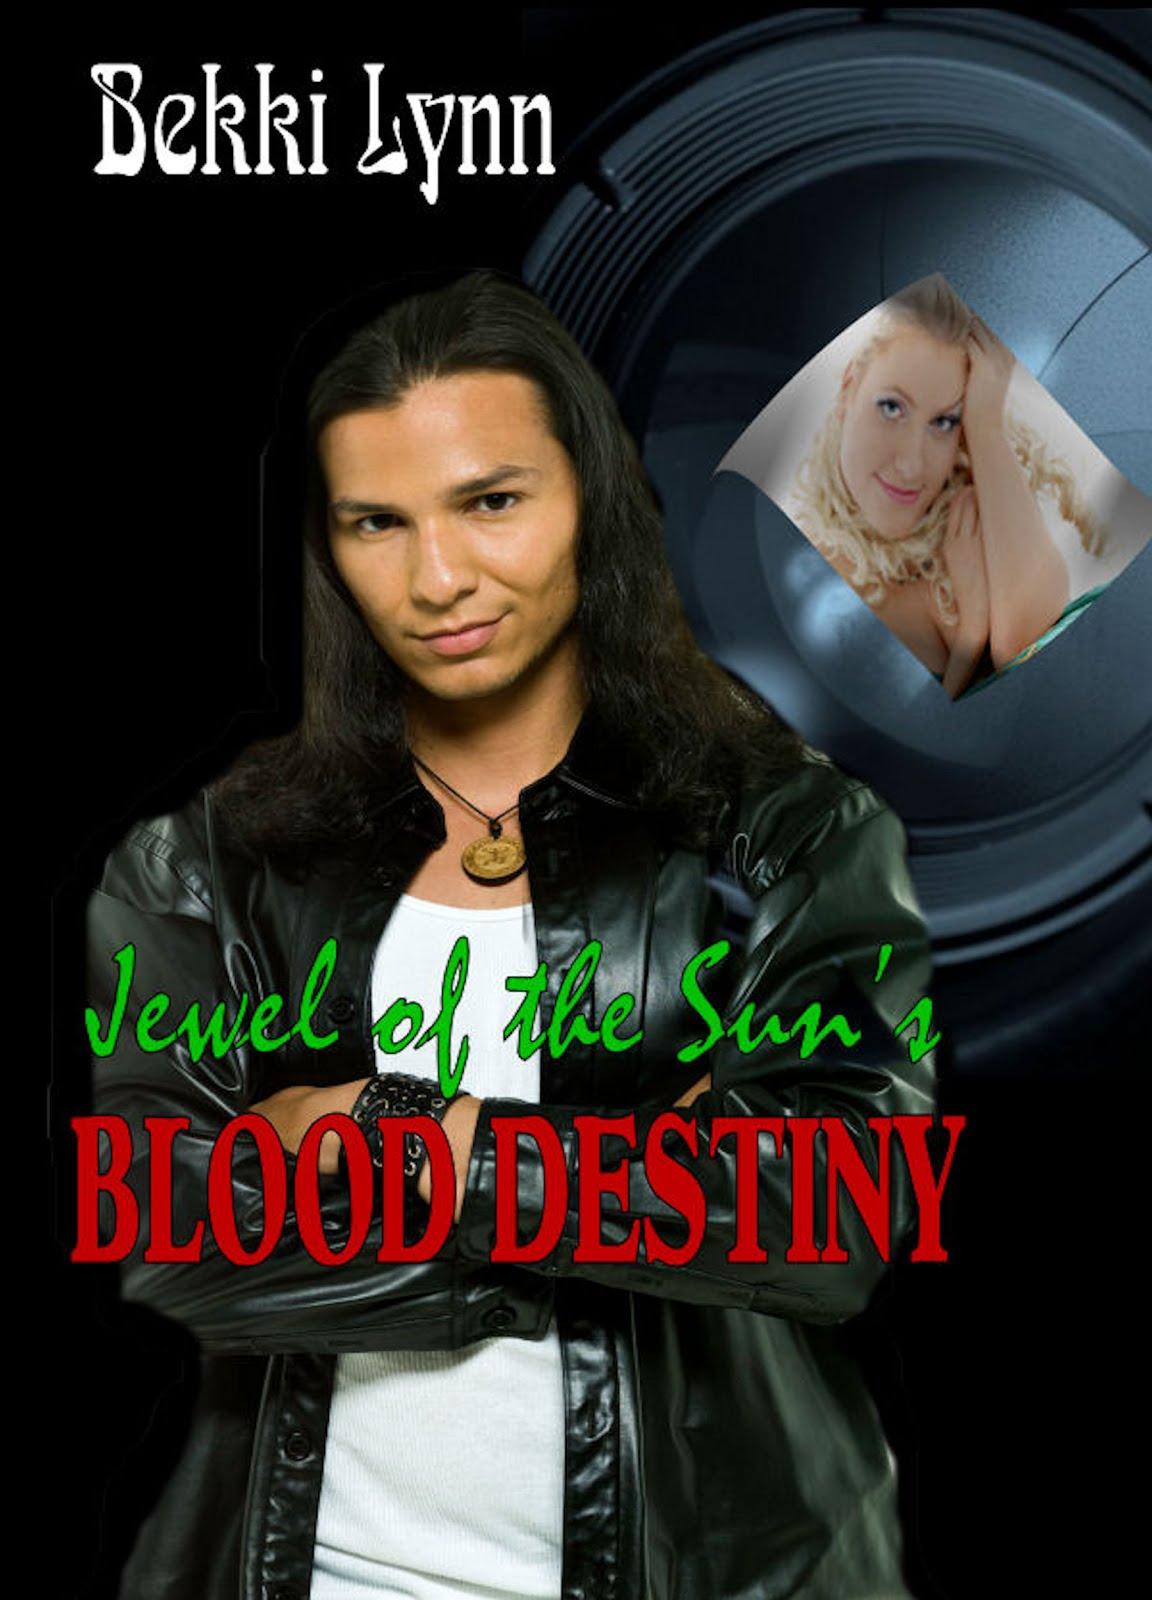 Jewel of the Sun's BLOOD DESTINY